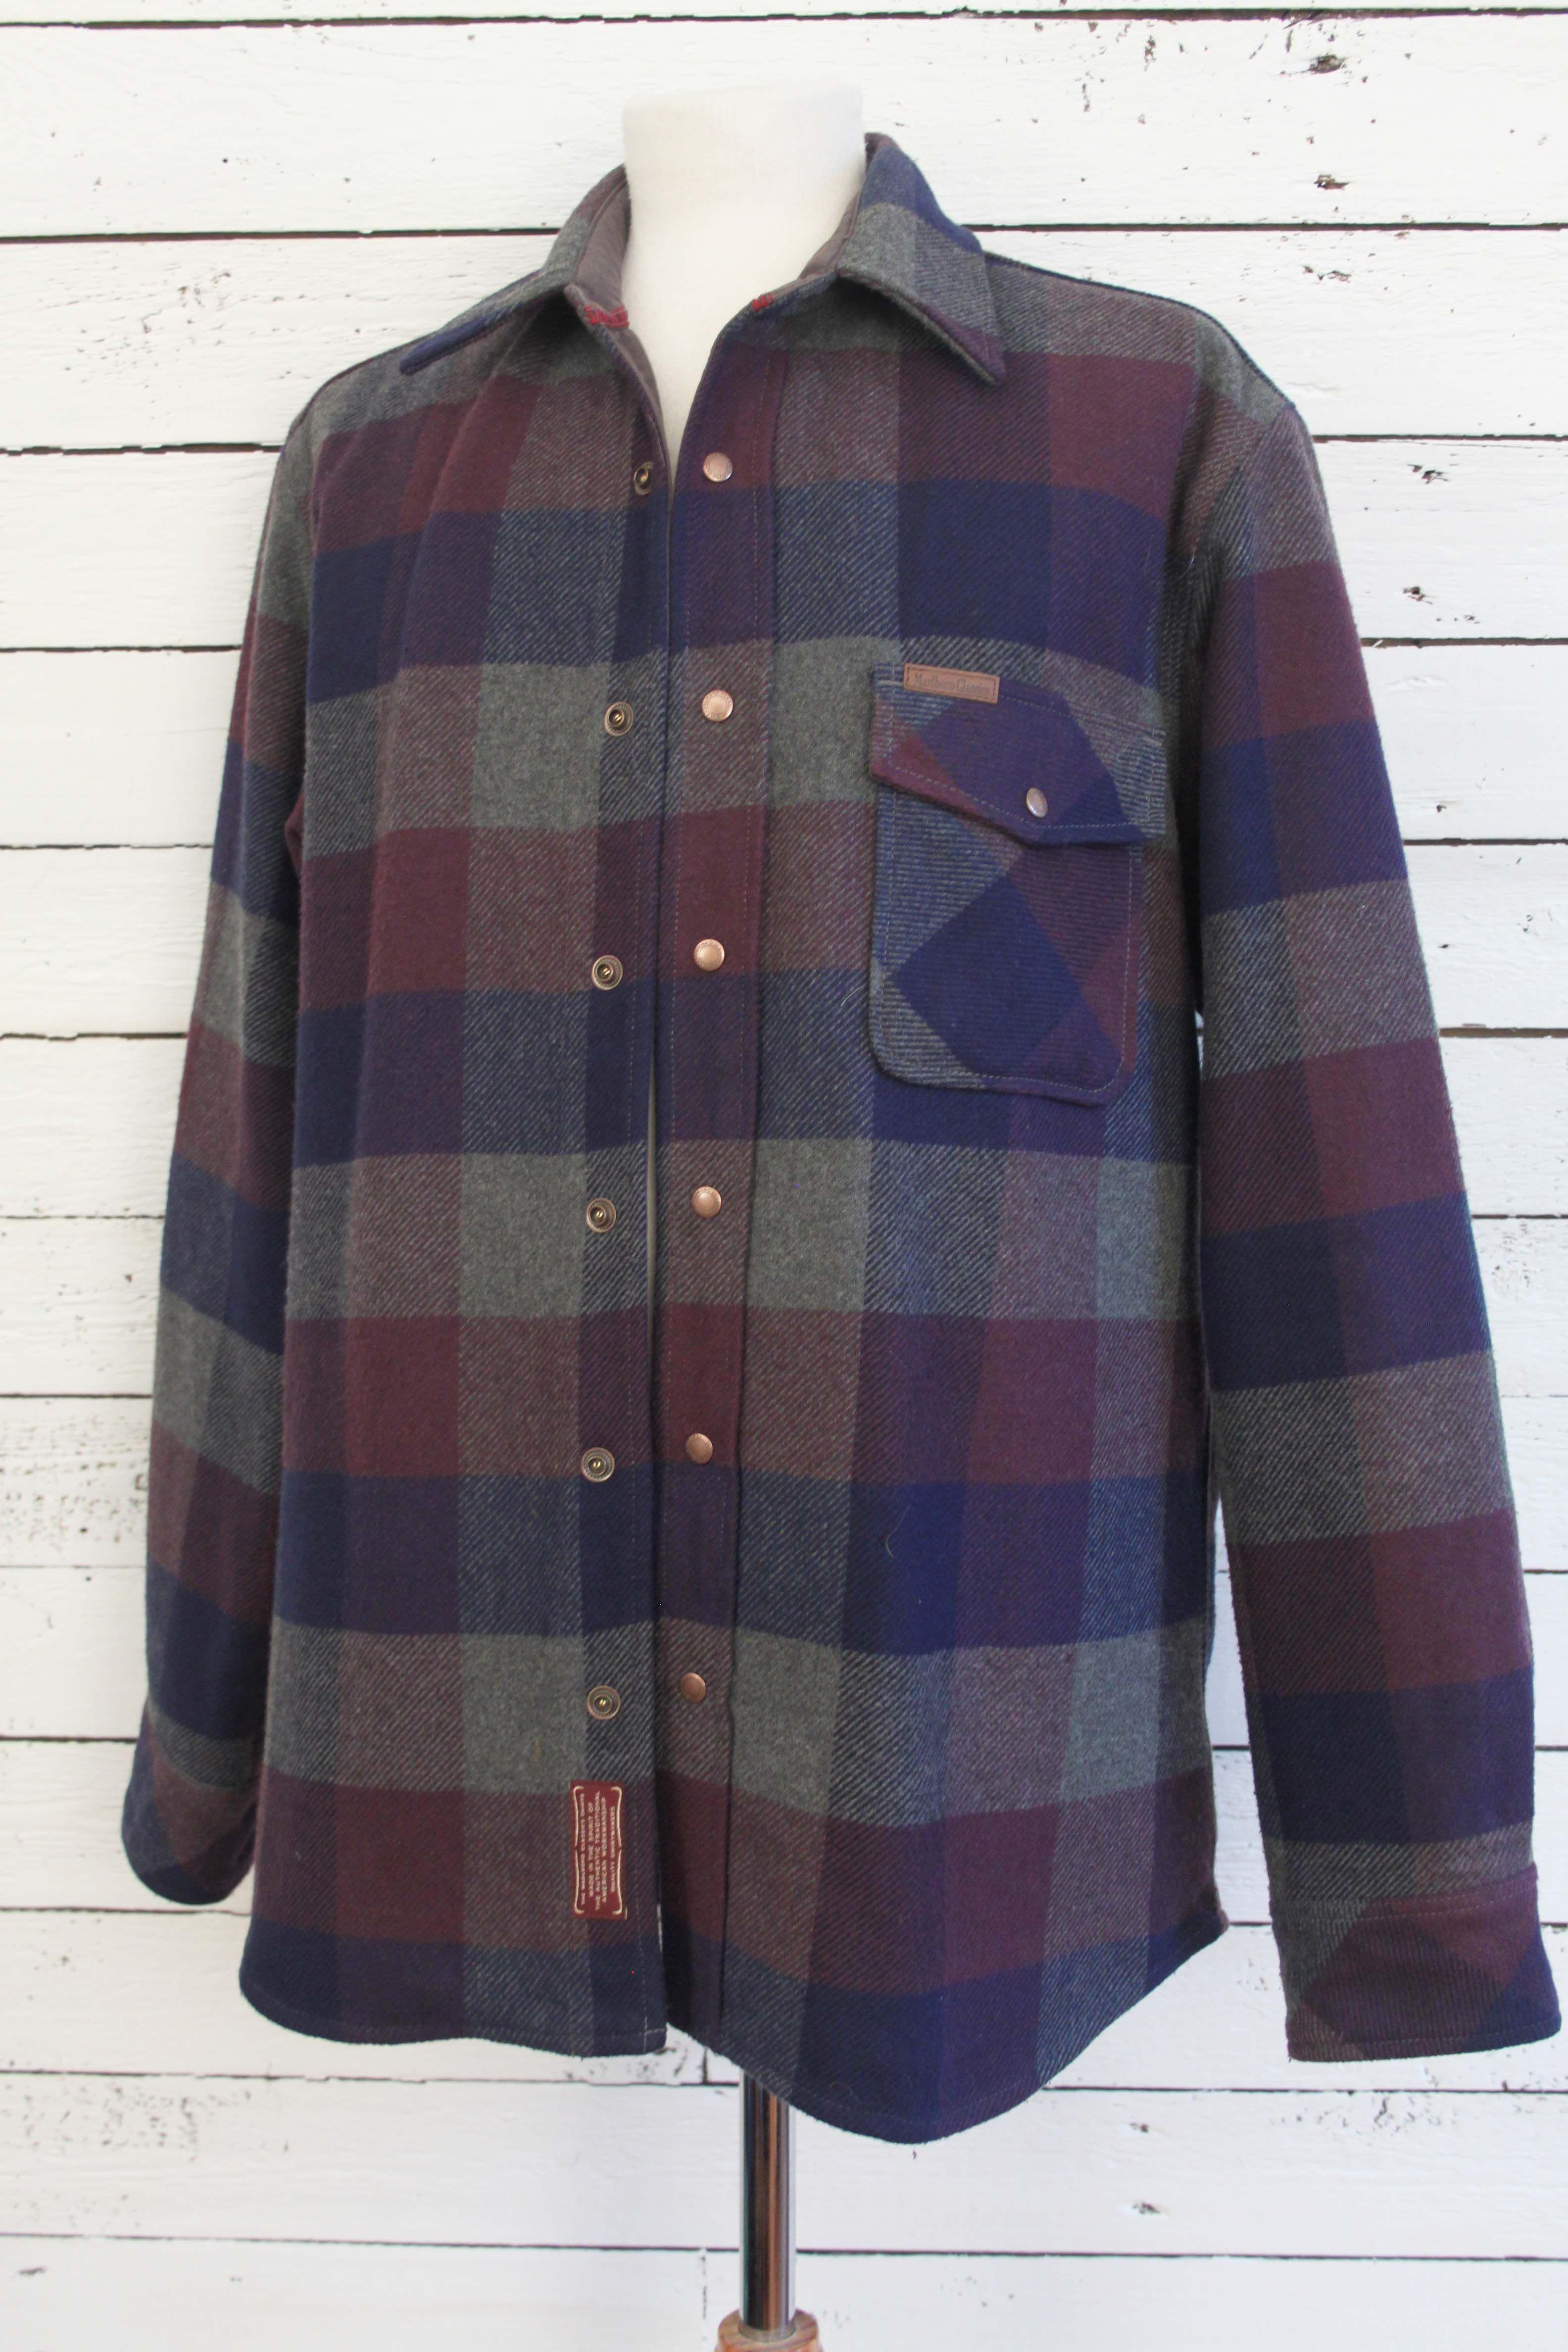 Marlboro Jas Vintage Of Dunne Blouse JacketDikke Classic Square 45c3AqRjL